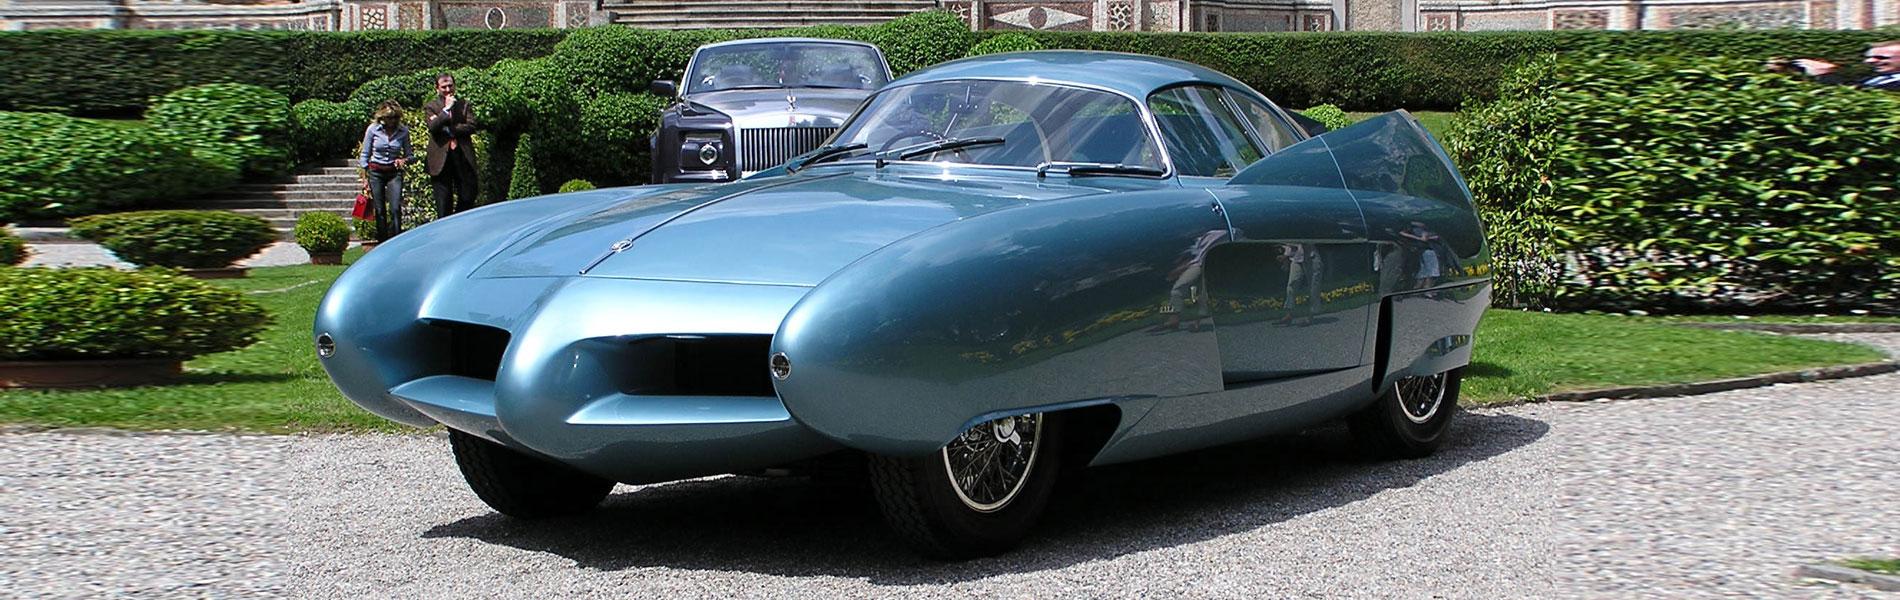 Bertone Alfa Romeo BAT 7 1954 - Immagine Jan Ter Hedde - Coachbuilder.com